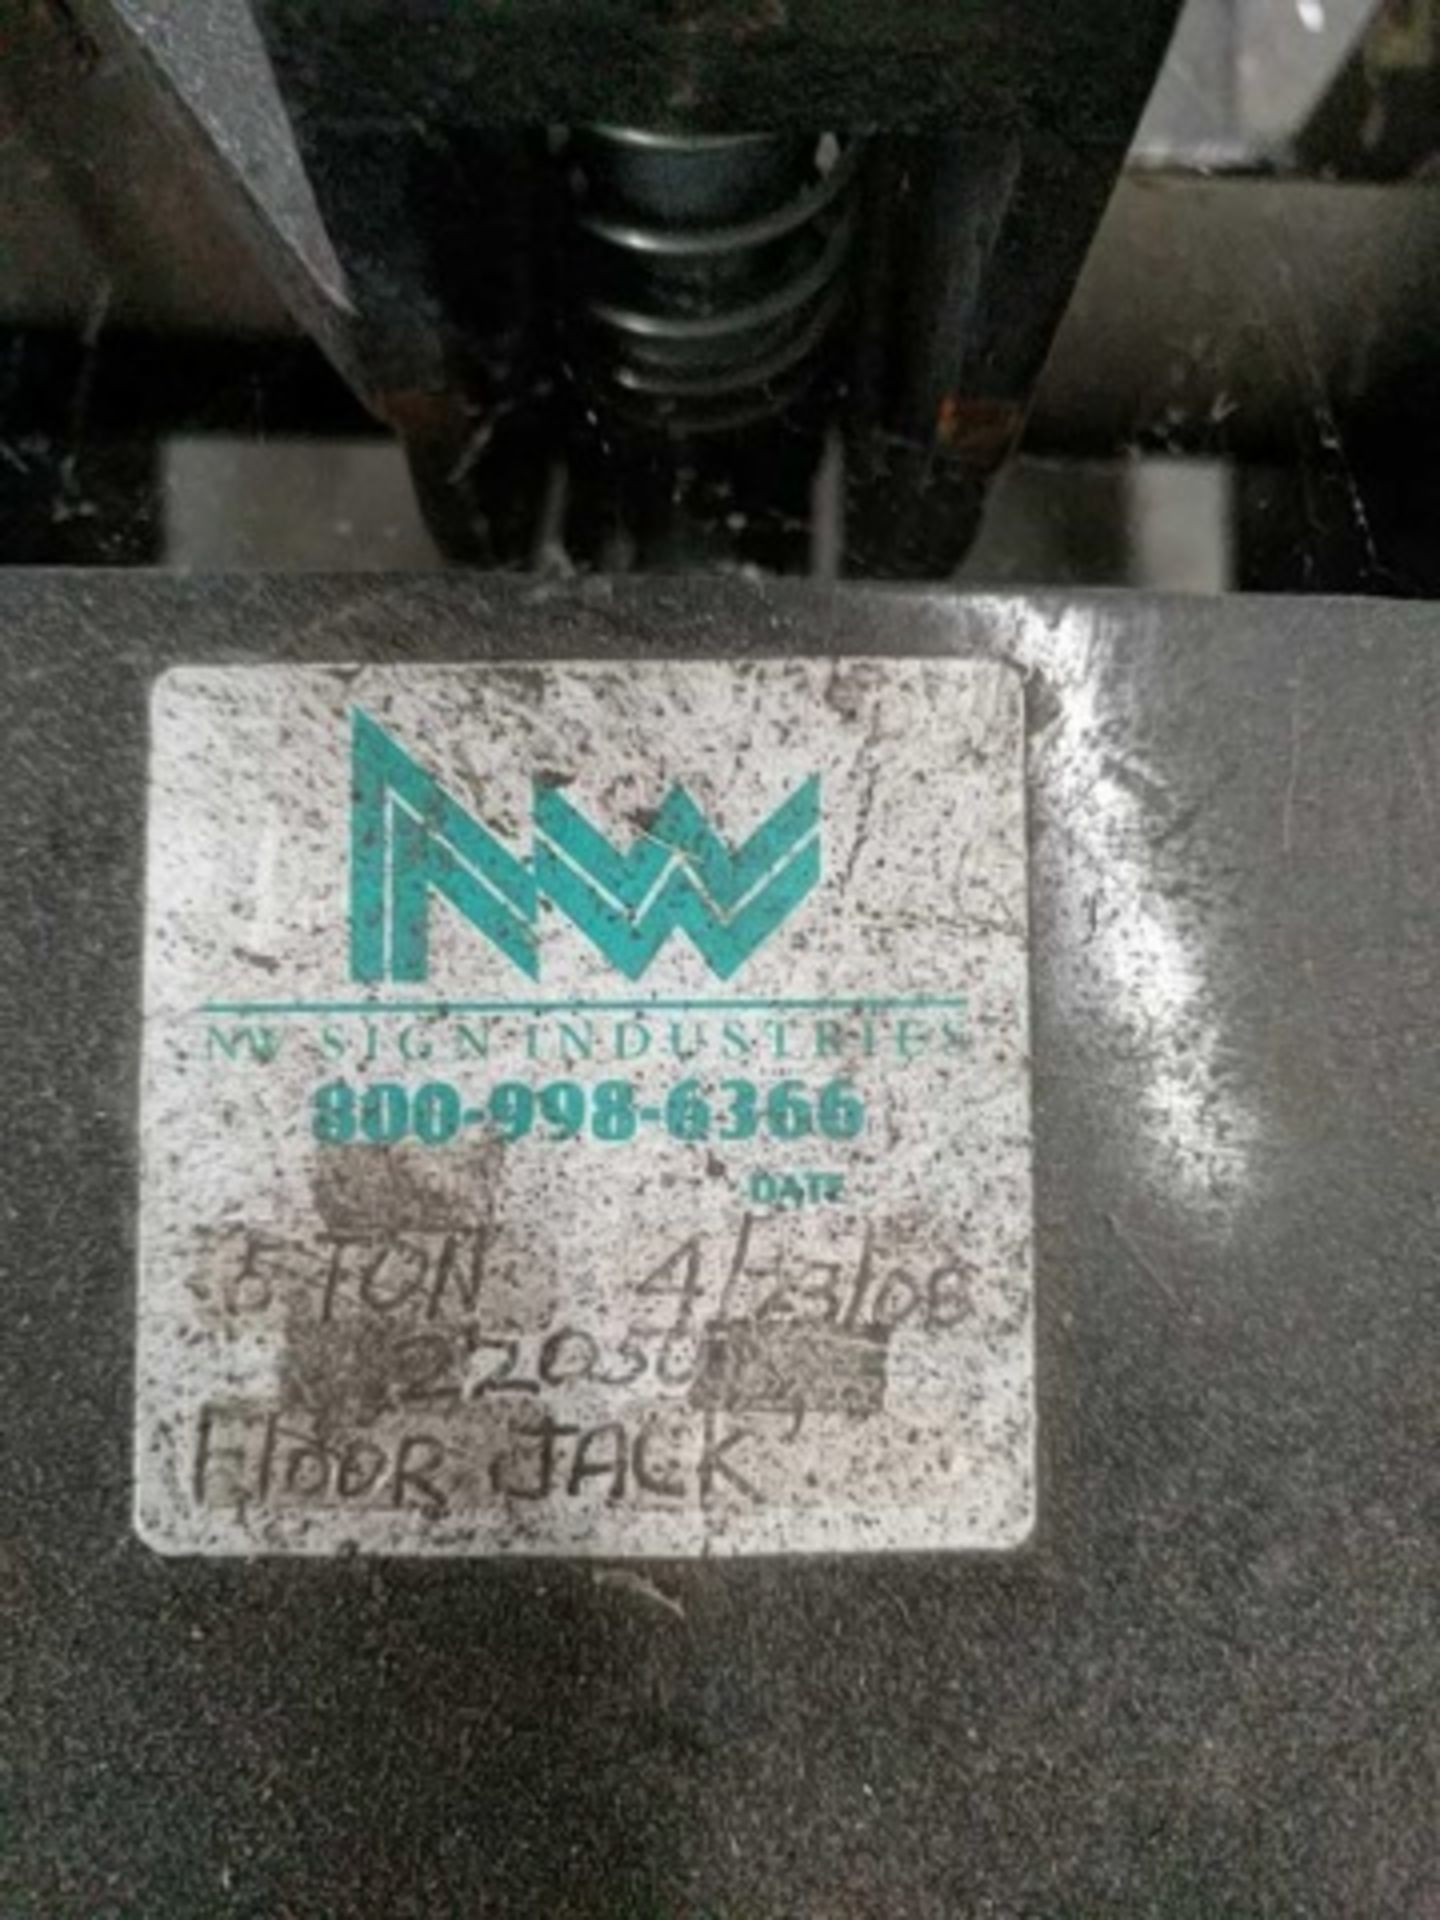 Hydraulic Floor Jack model 22050C - Image 3 of 3